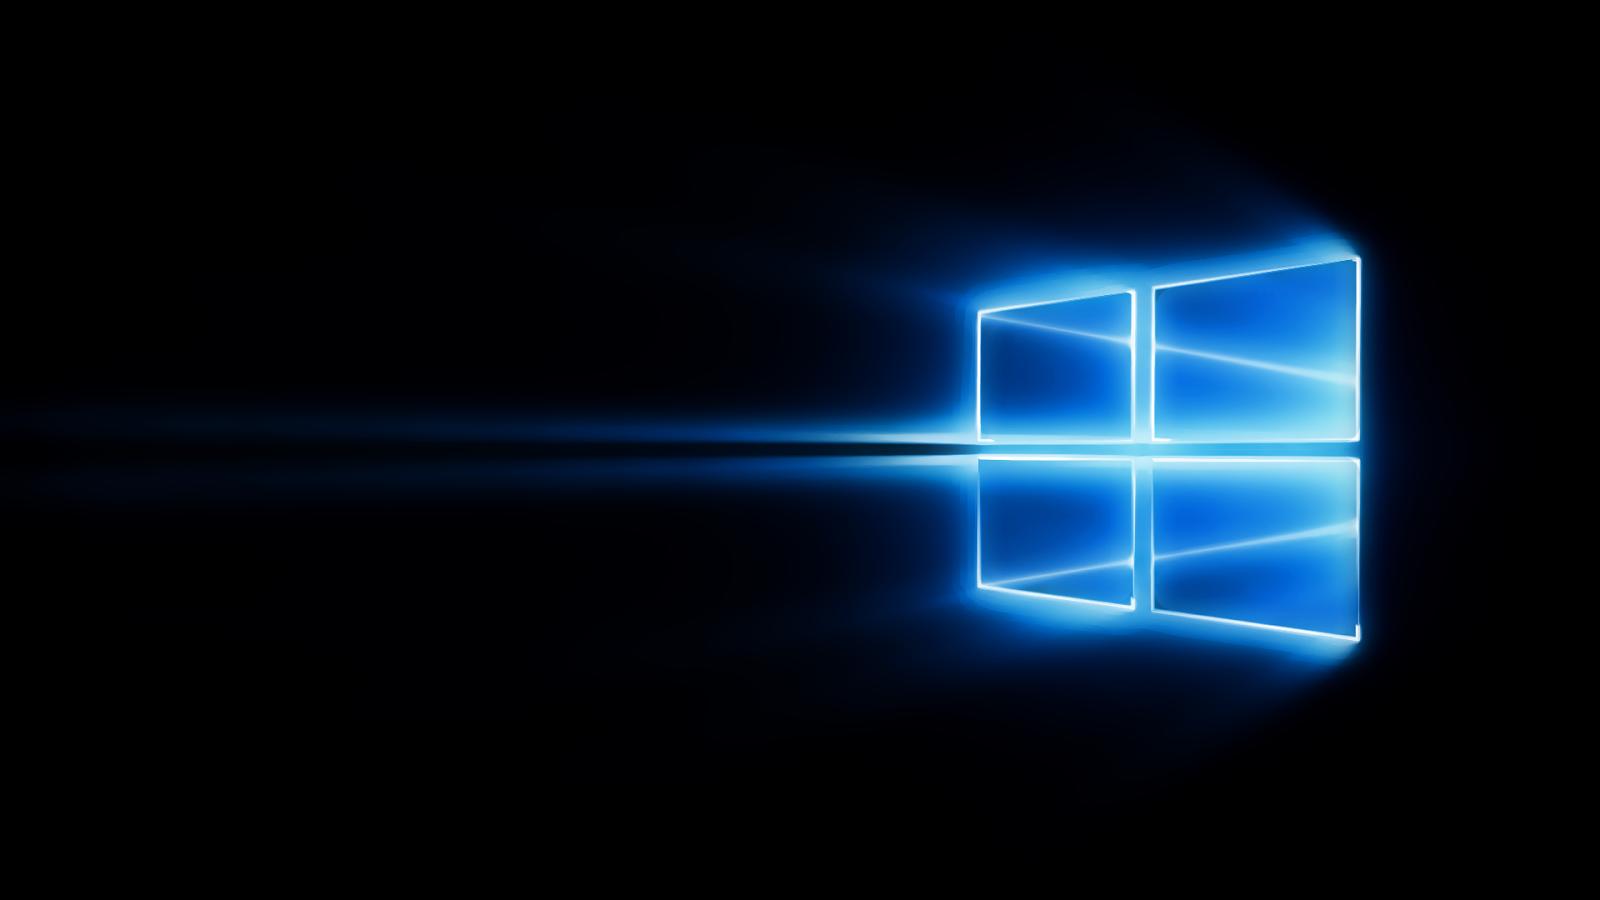 Wallpaper download for windows 10 - Windows 10 Hd Wallpapers Free Windows 10 Wallpaper Free Download